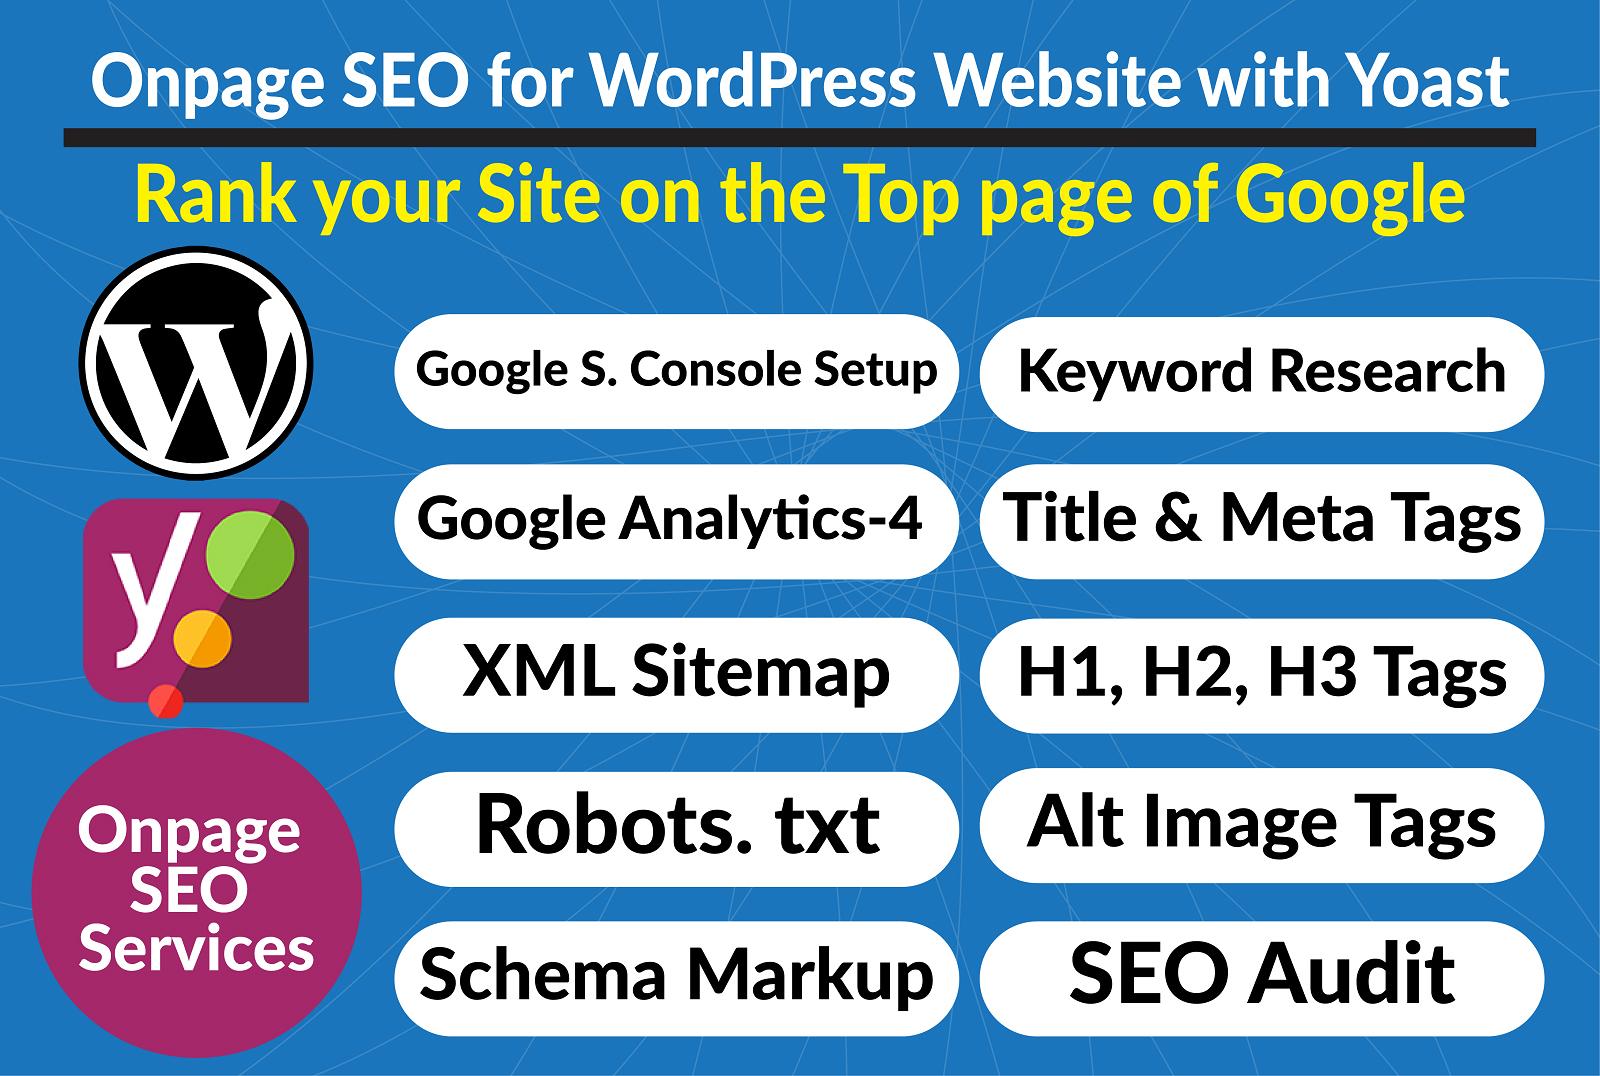 Onpage SEO for WordPress Website with Yoast